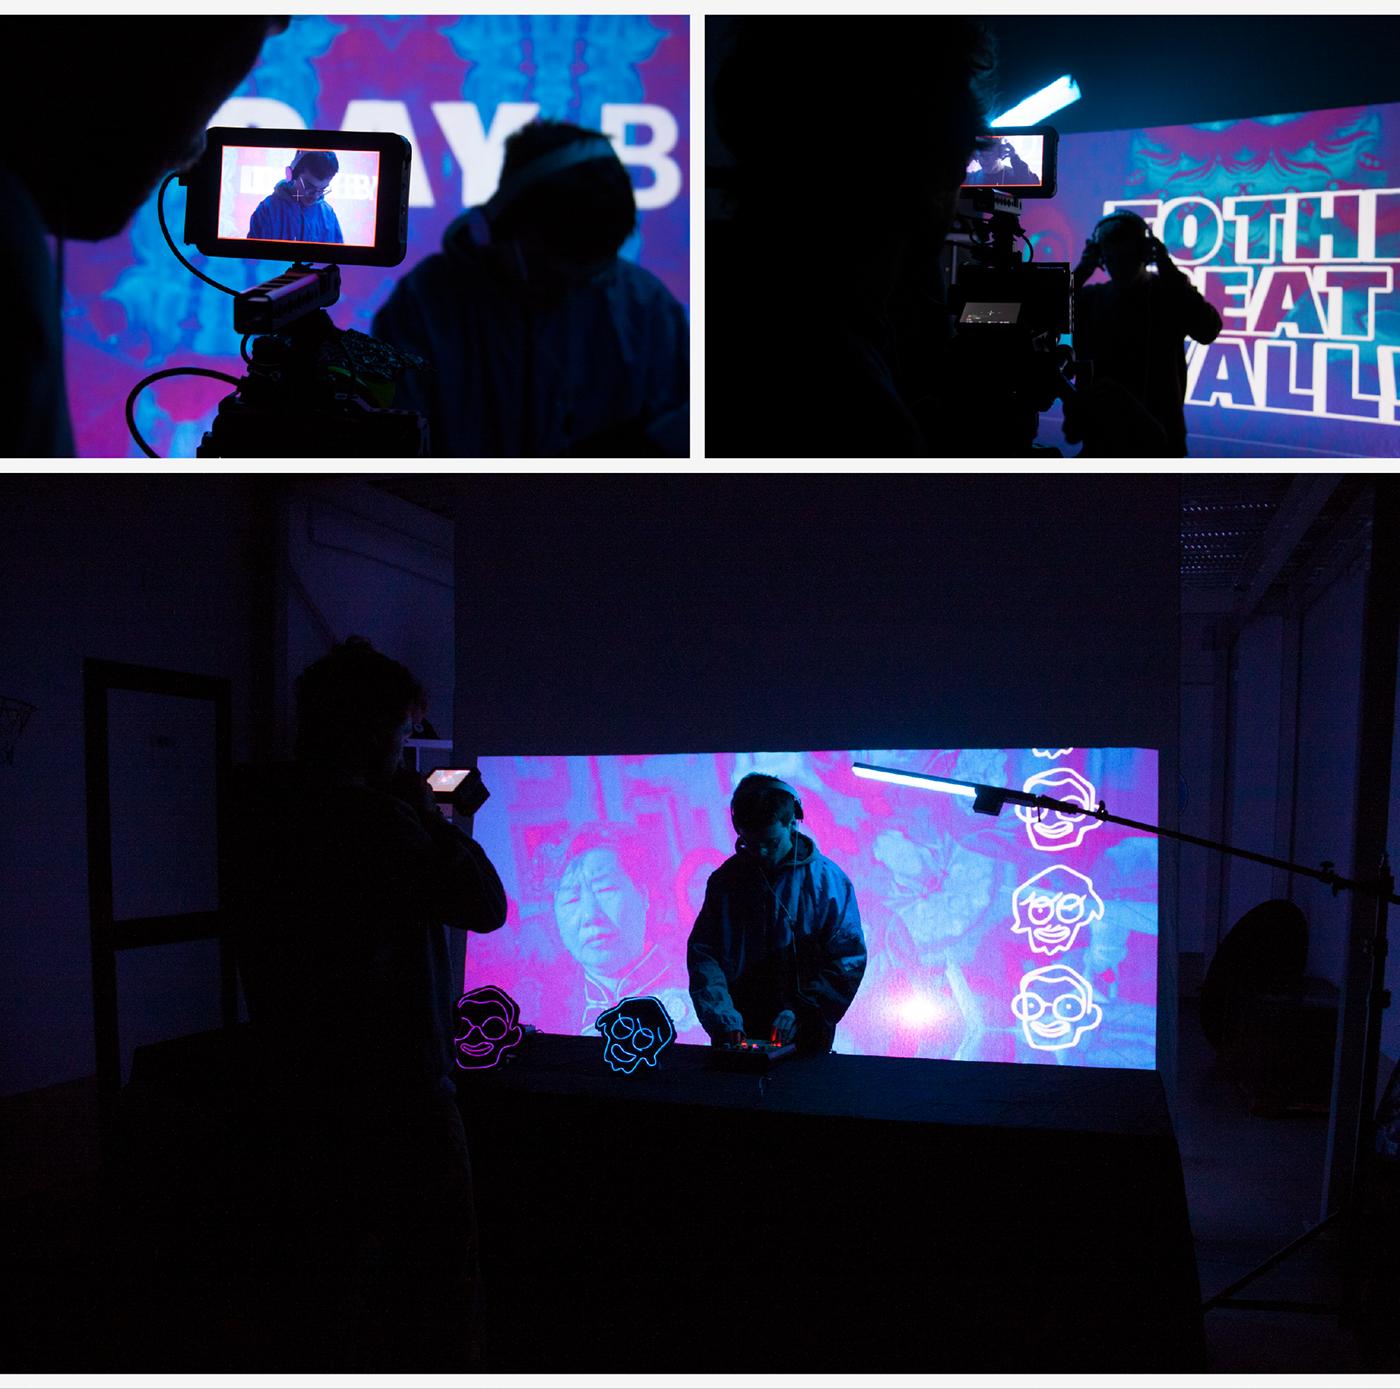 visual communication design music video promo graphic hip hop